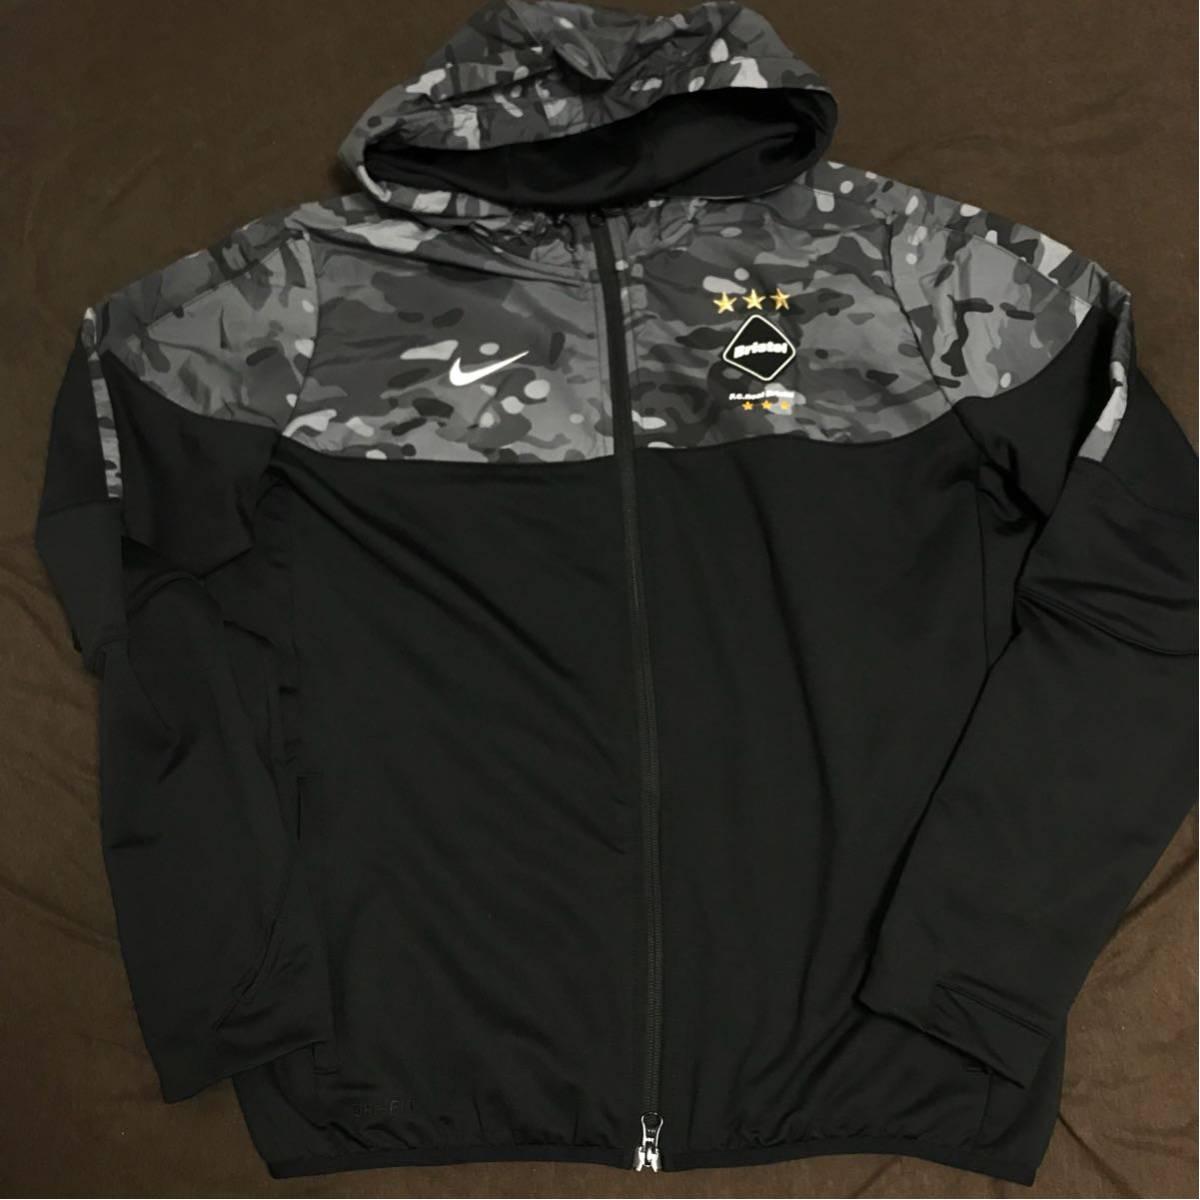 861c348ceb  新品M FCRB NIKE BRISTOL hoody hoodie パーカー カモフラ sophnet jacket fragment gyakusou  real